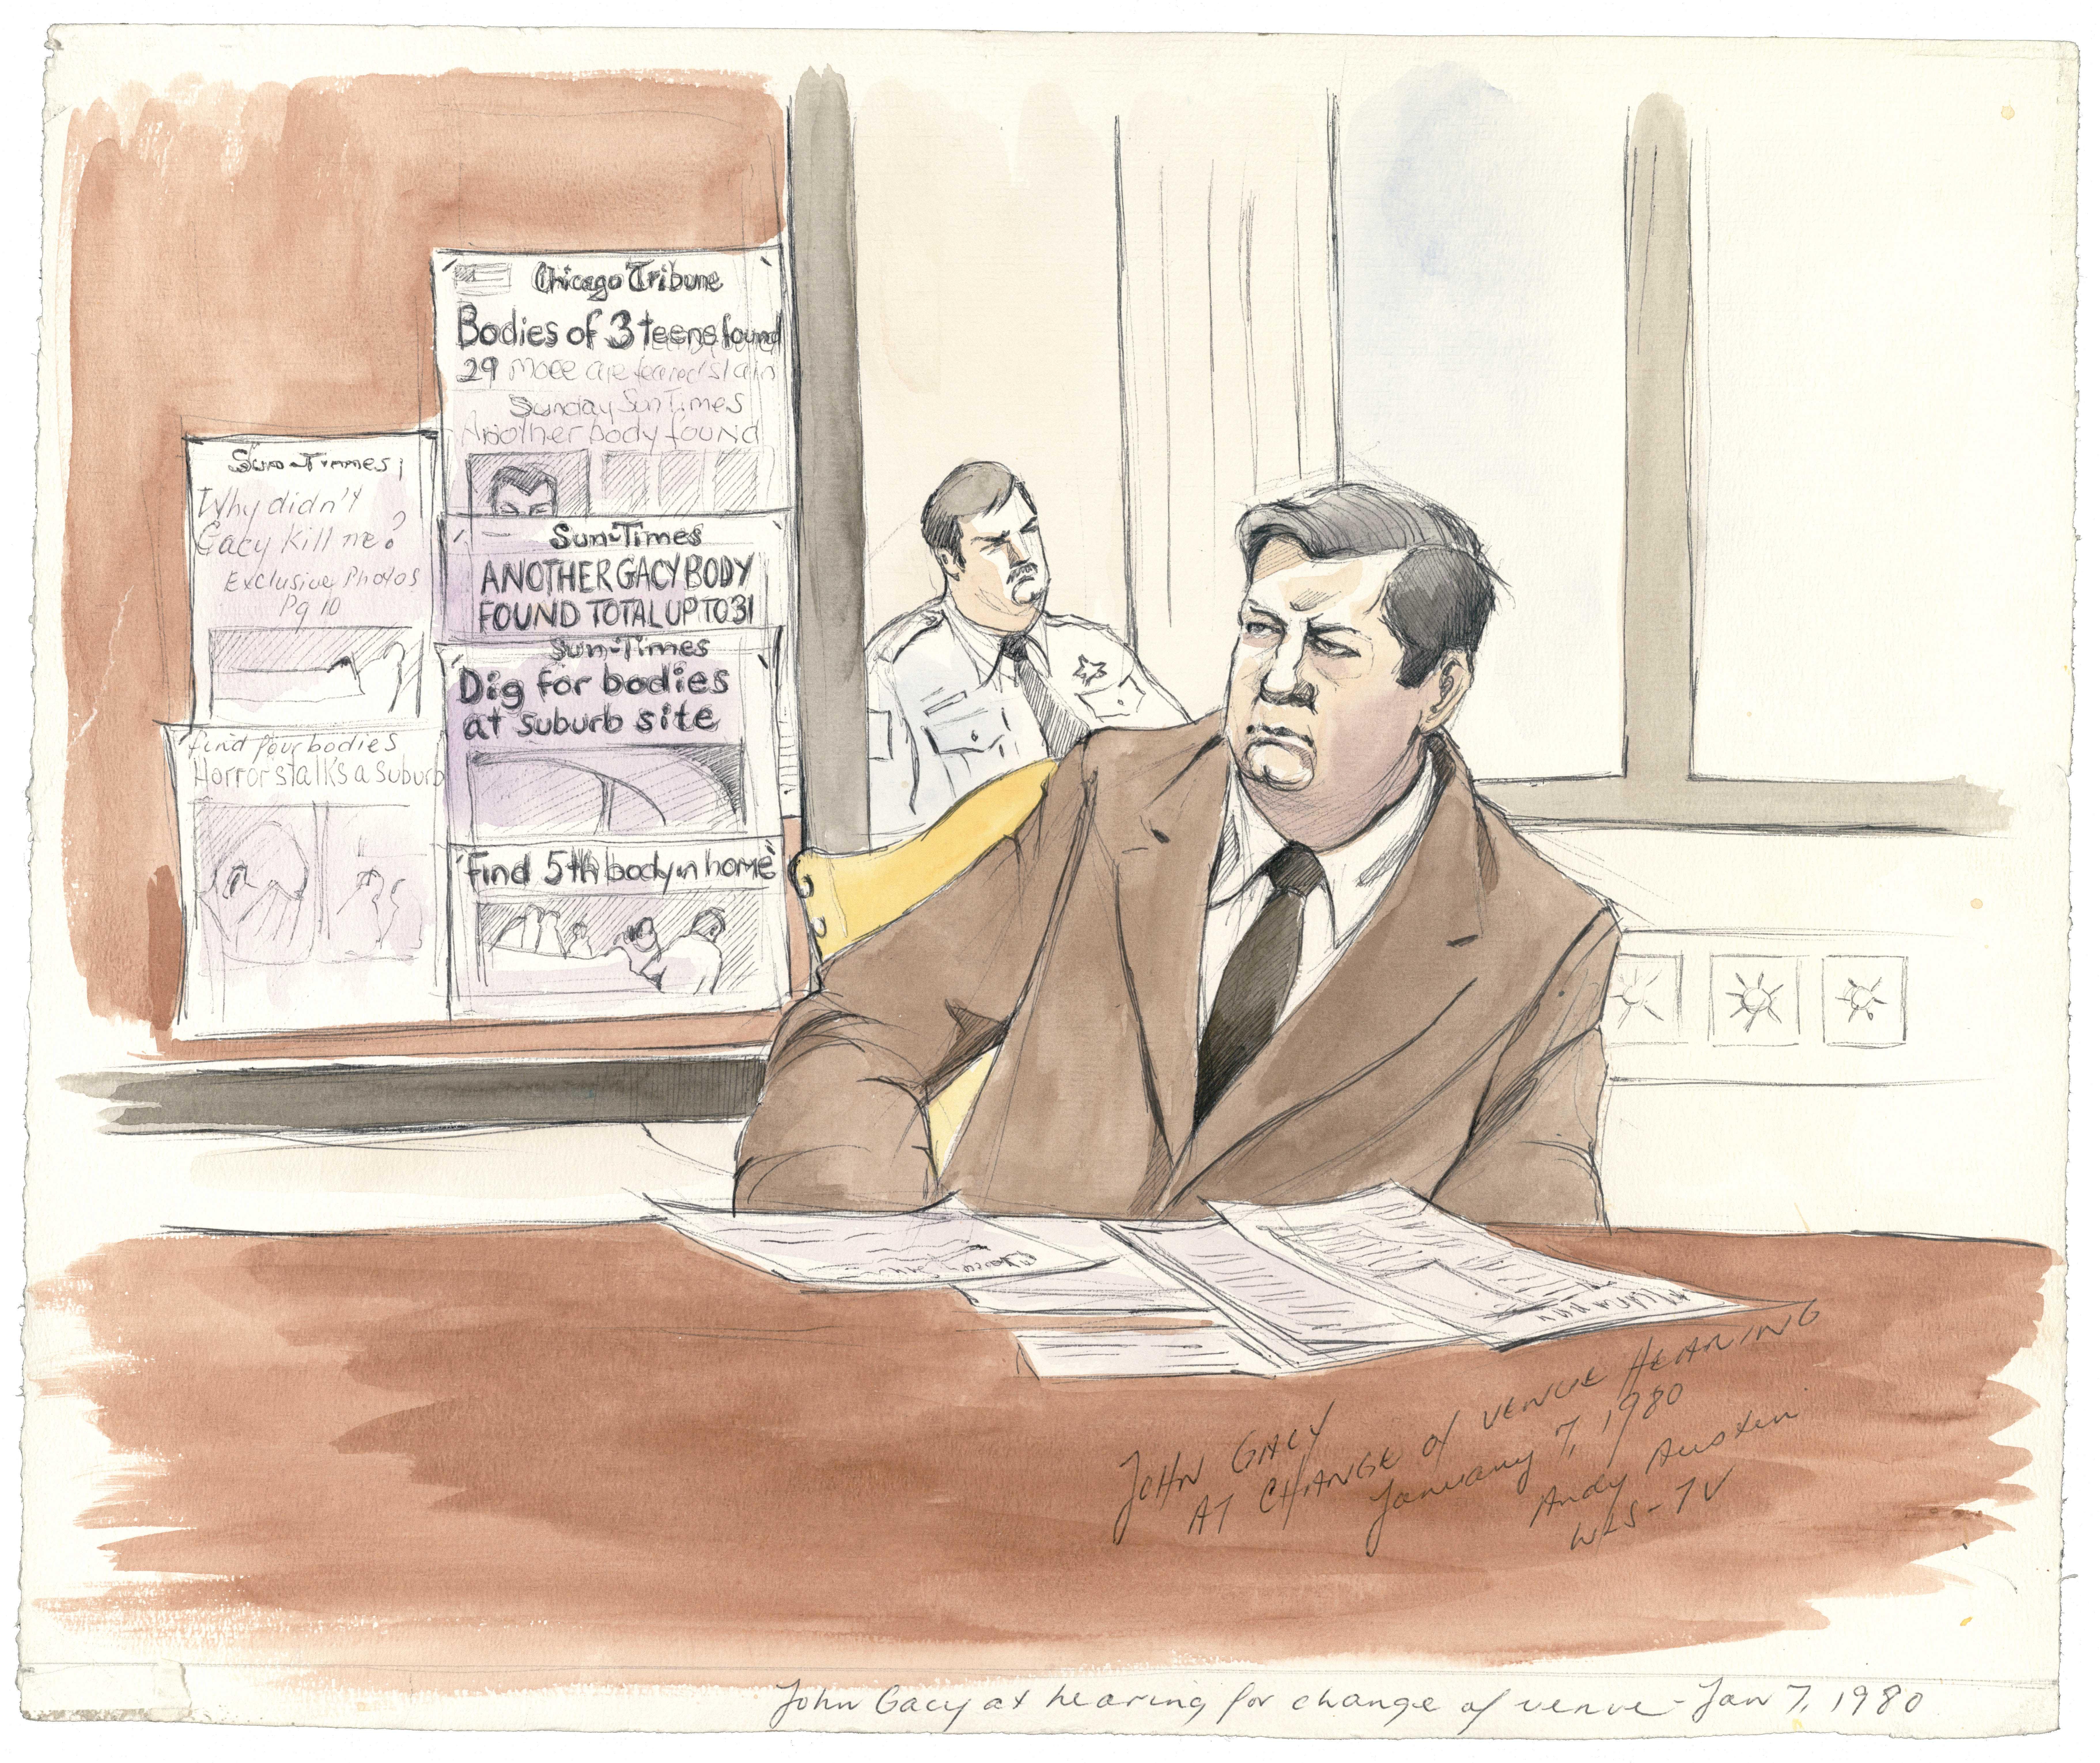 John Wayne Gacy Trial, 1980